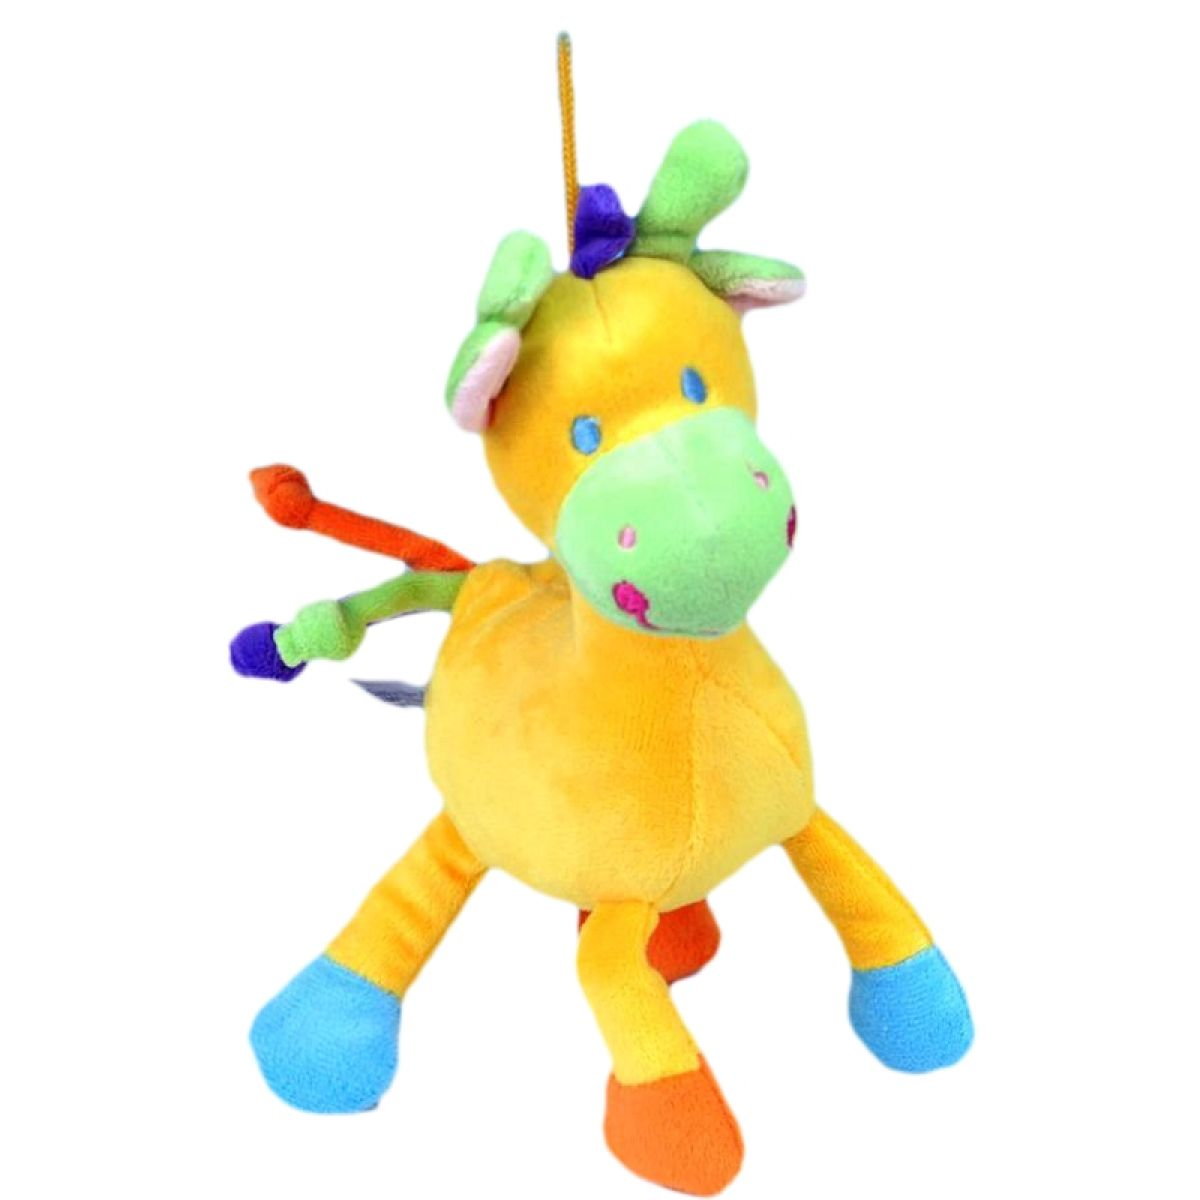 Teddies Žirafa chrastítko plyš 22cm - Žlutá